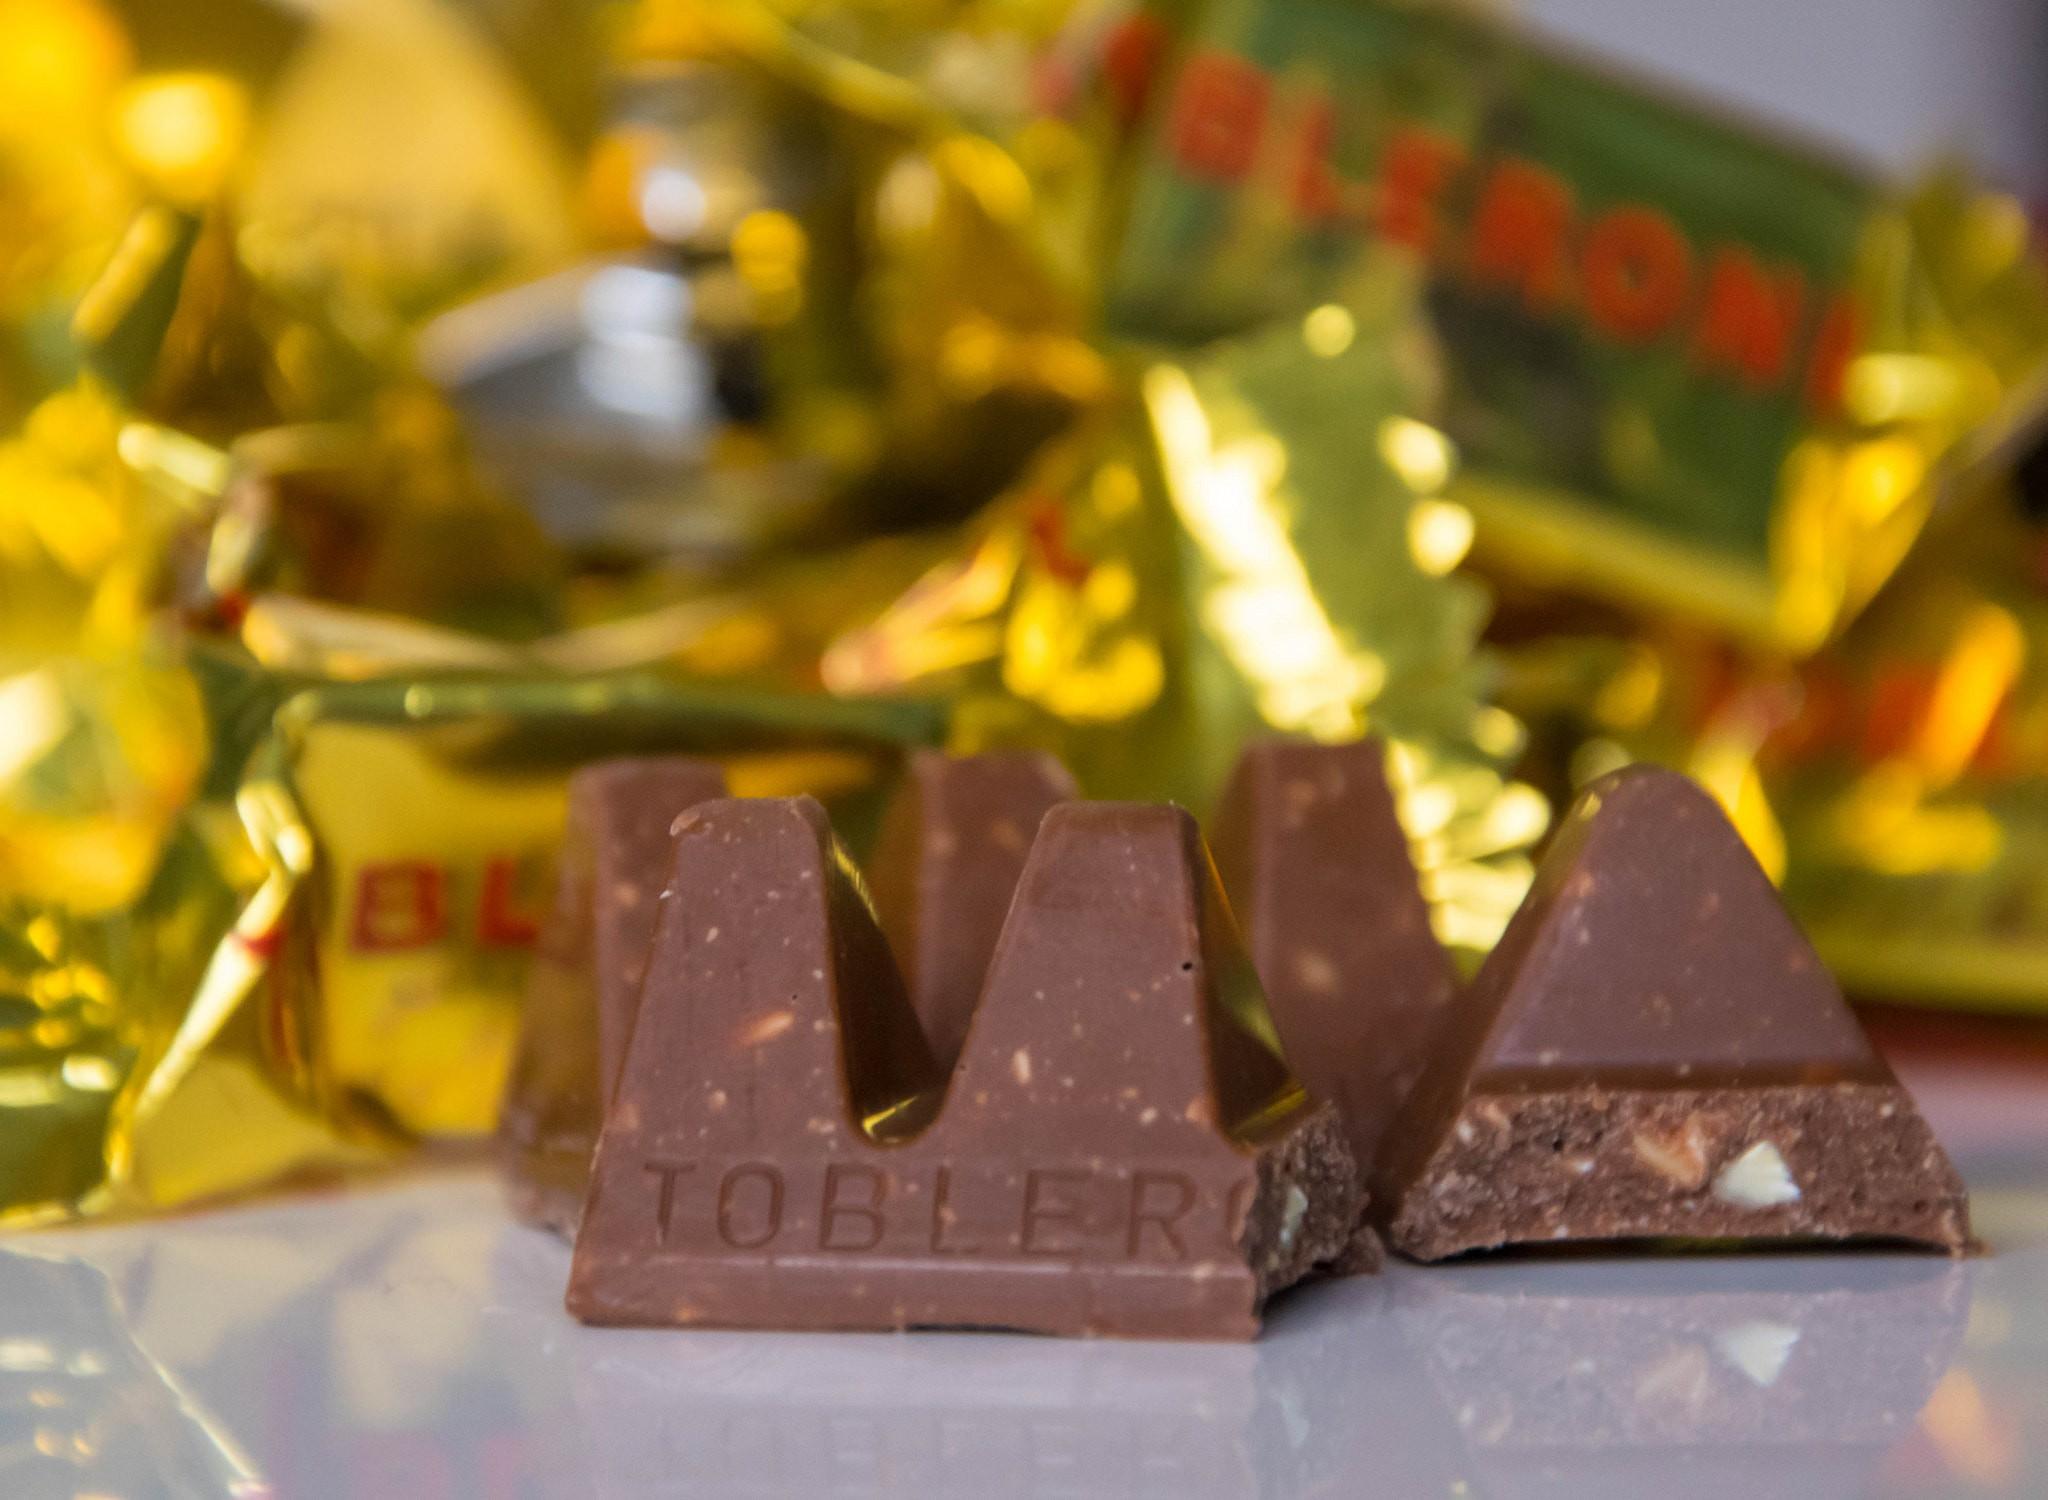 Toblerone | © Mary Eklind/ Flickr